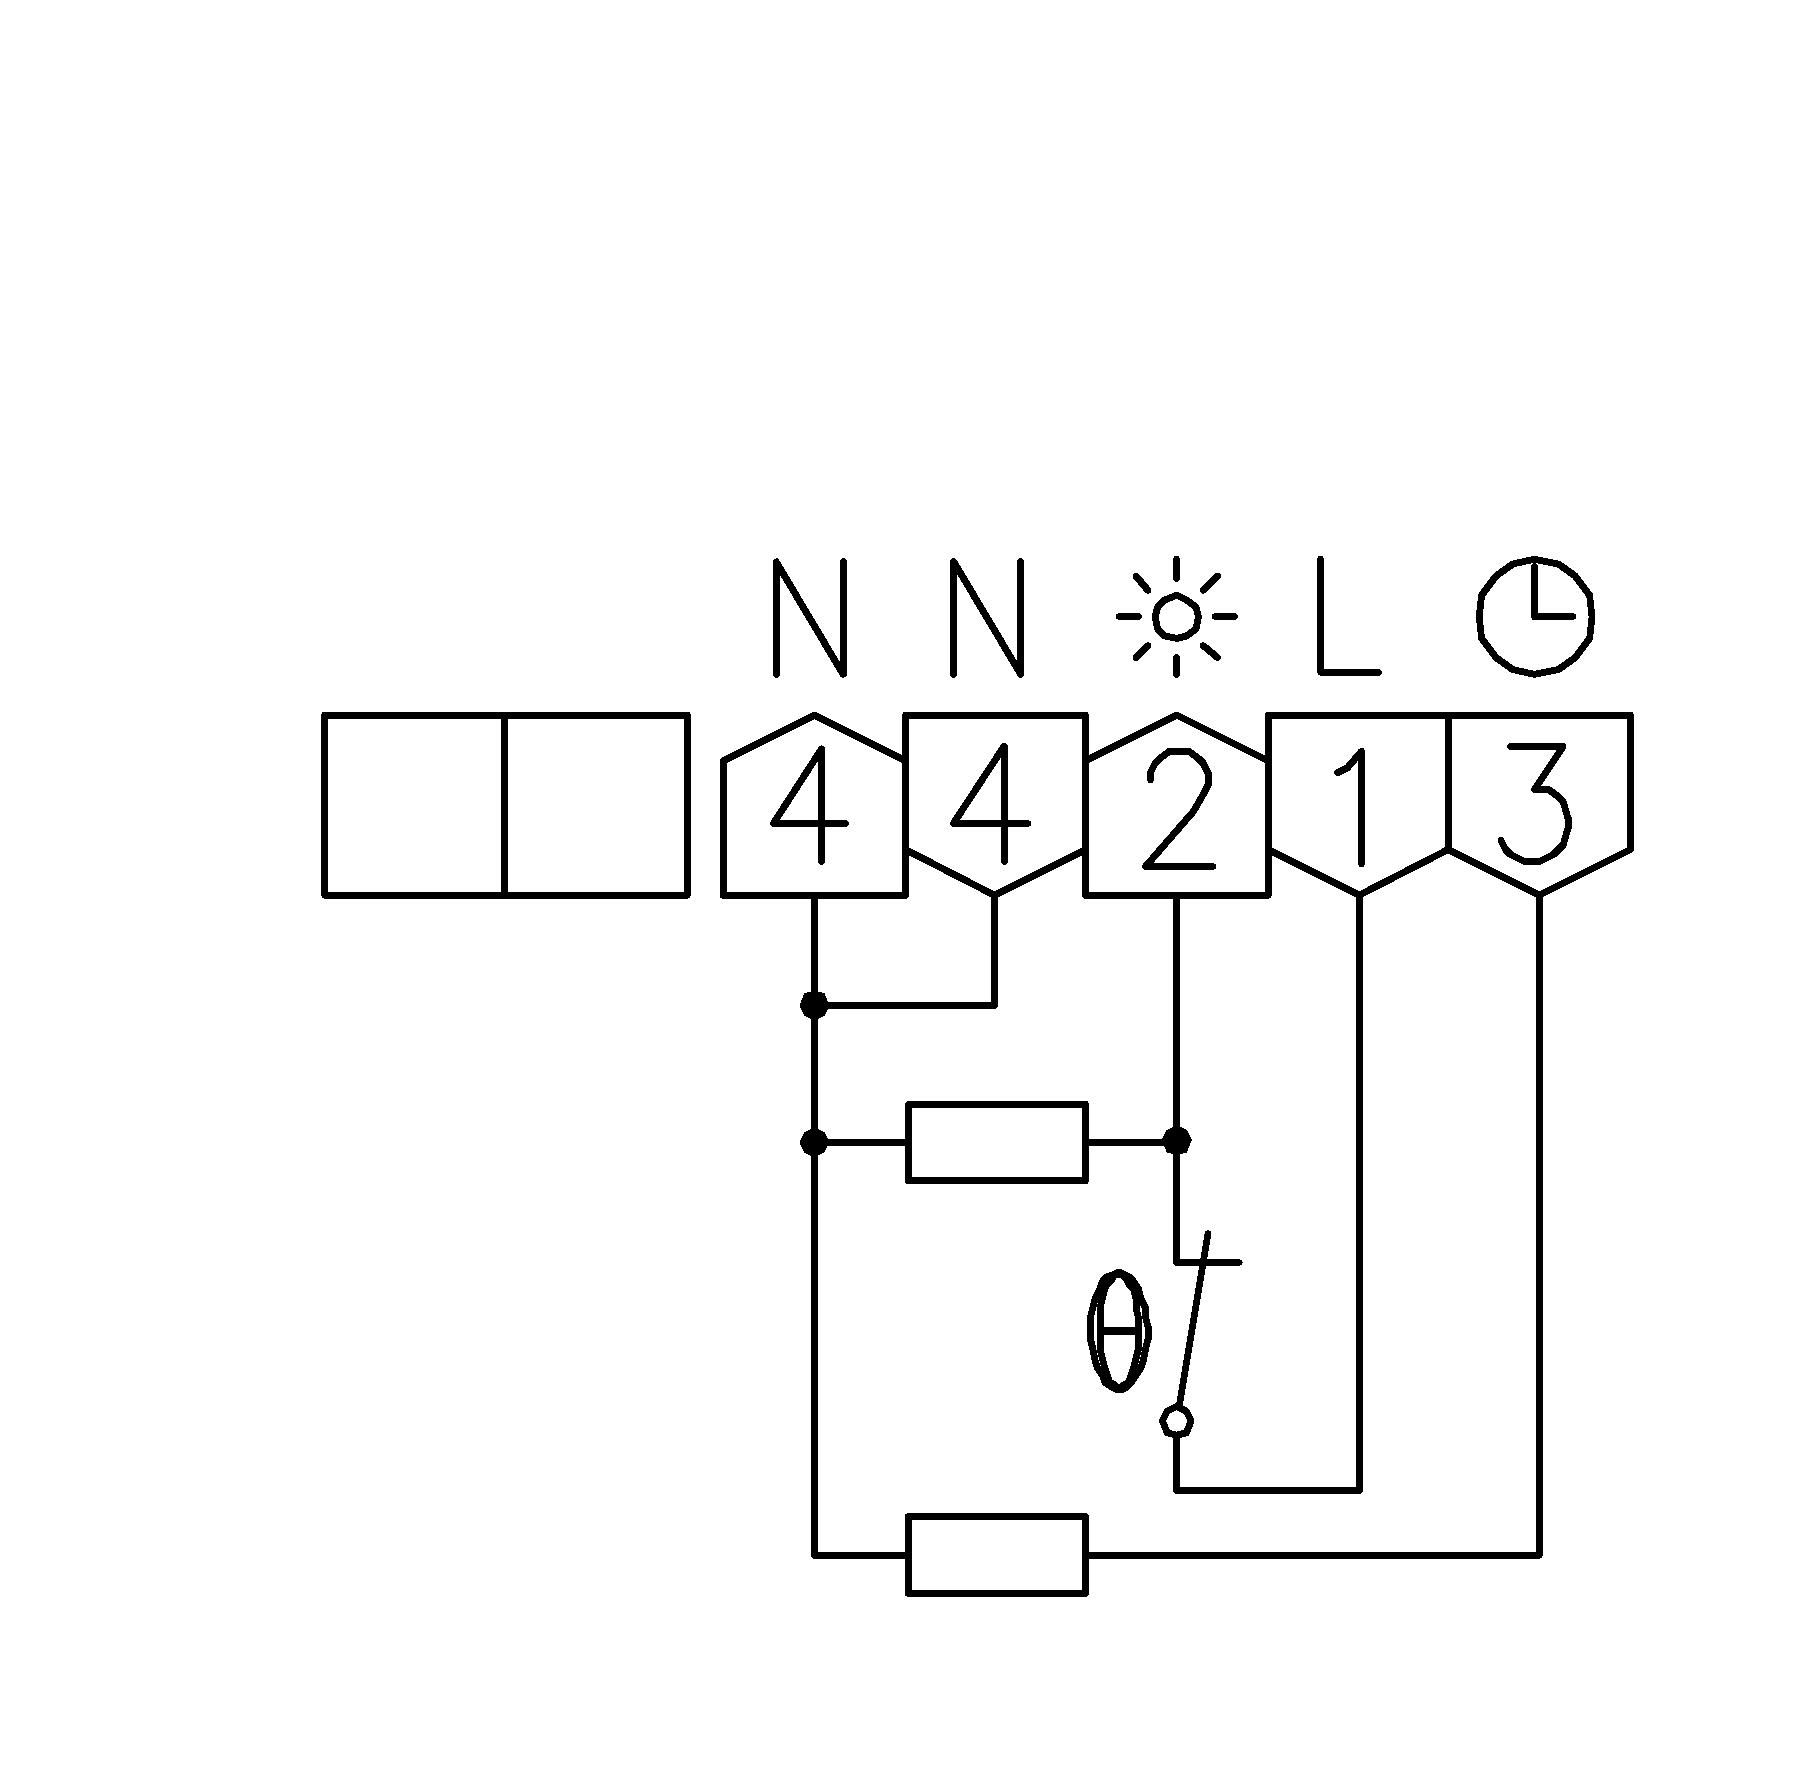 MA011700 Circuit diagram